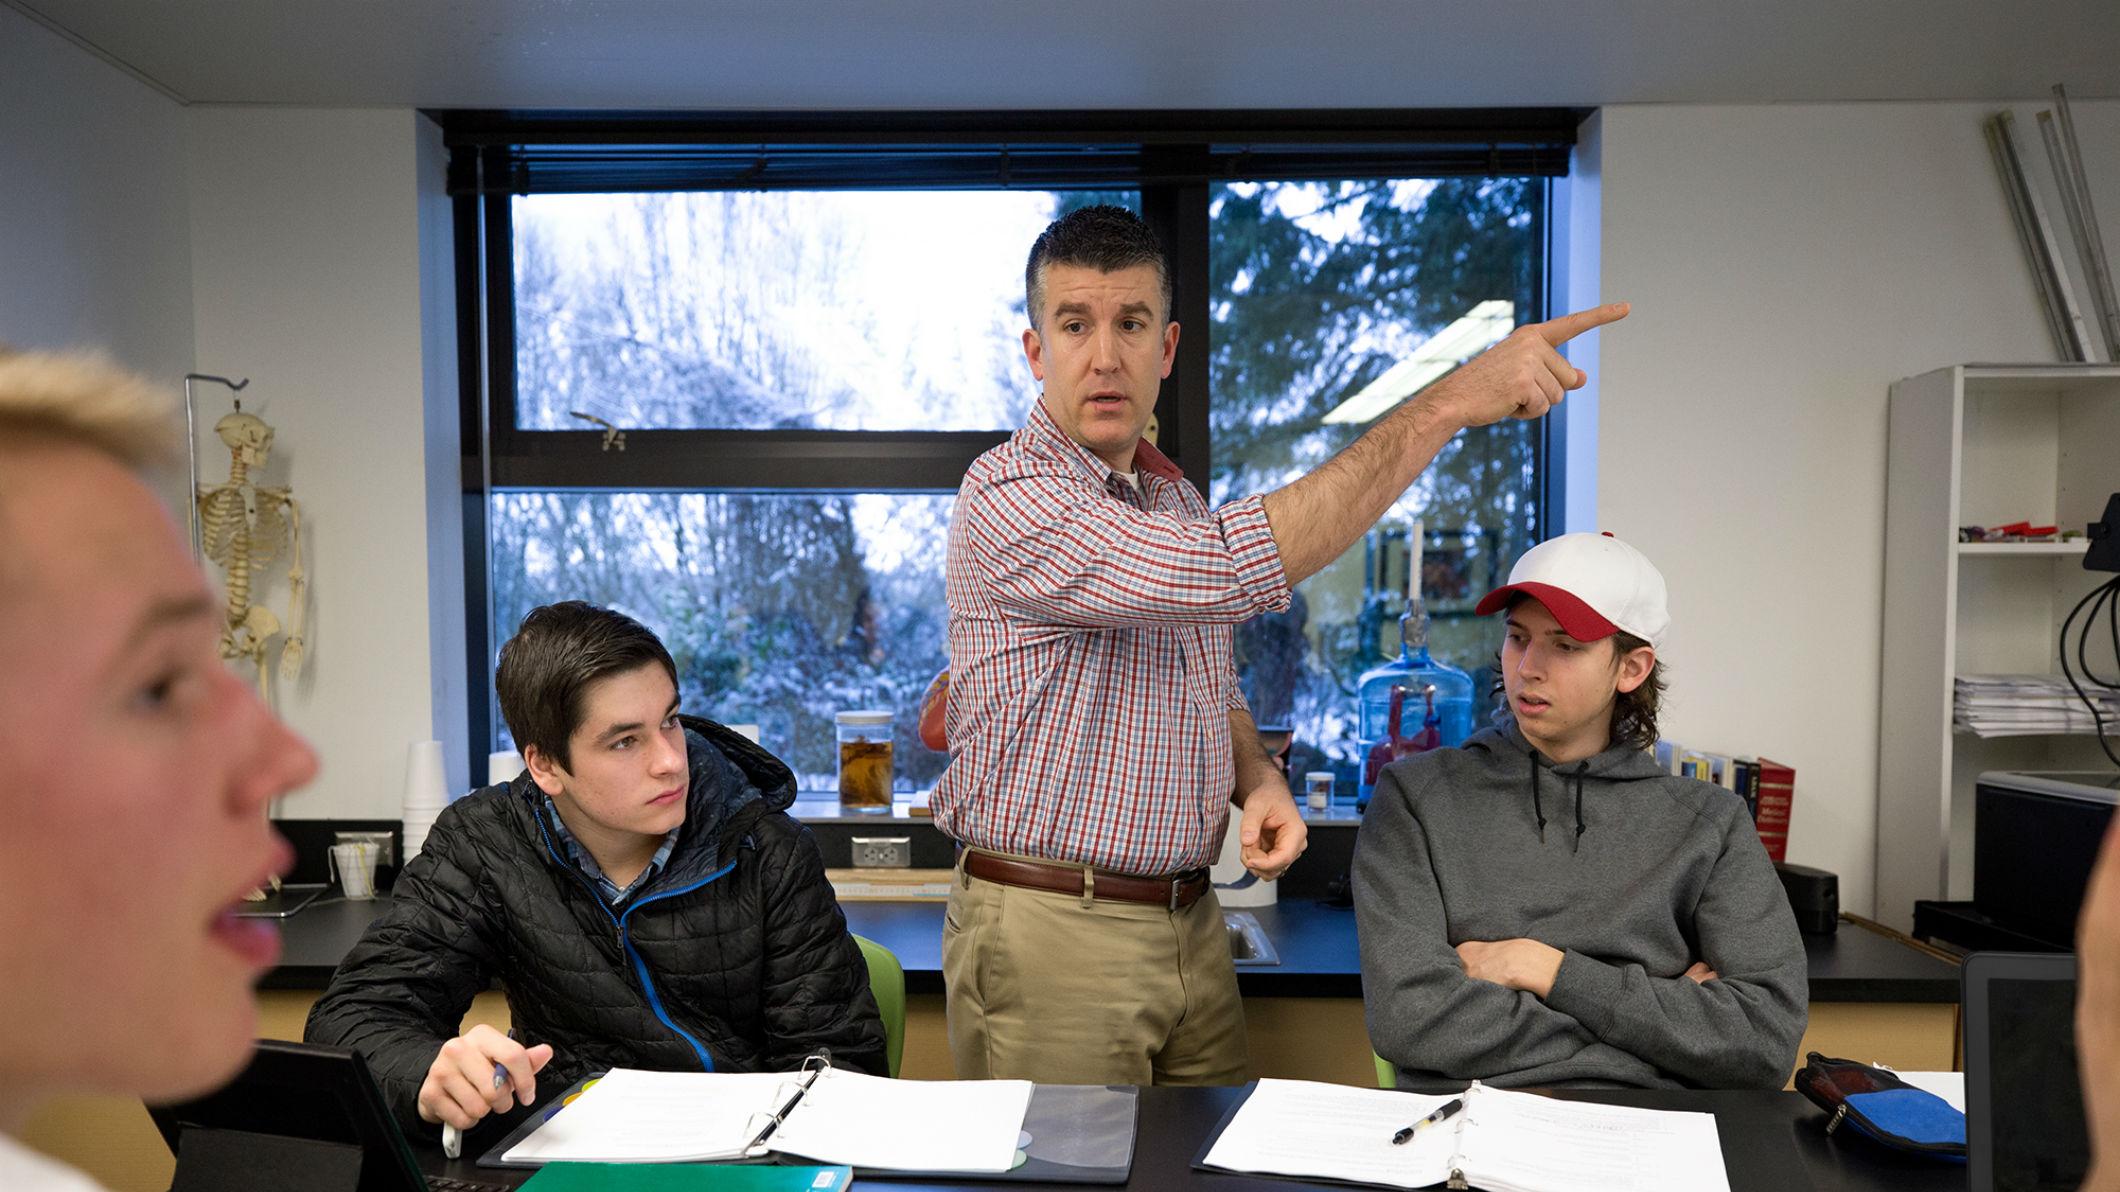 A teacher teaching CS to students